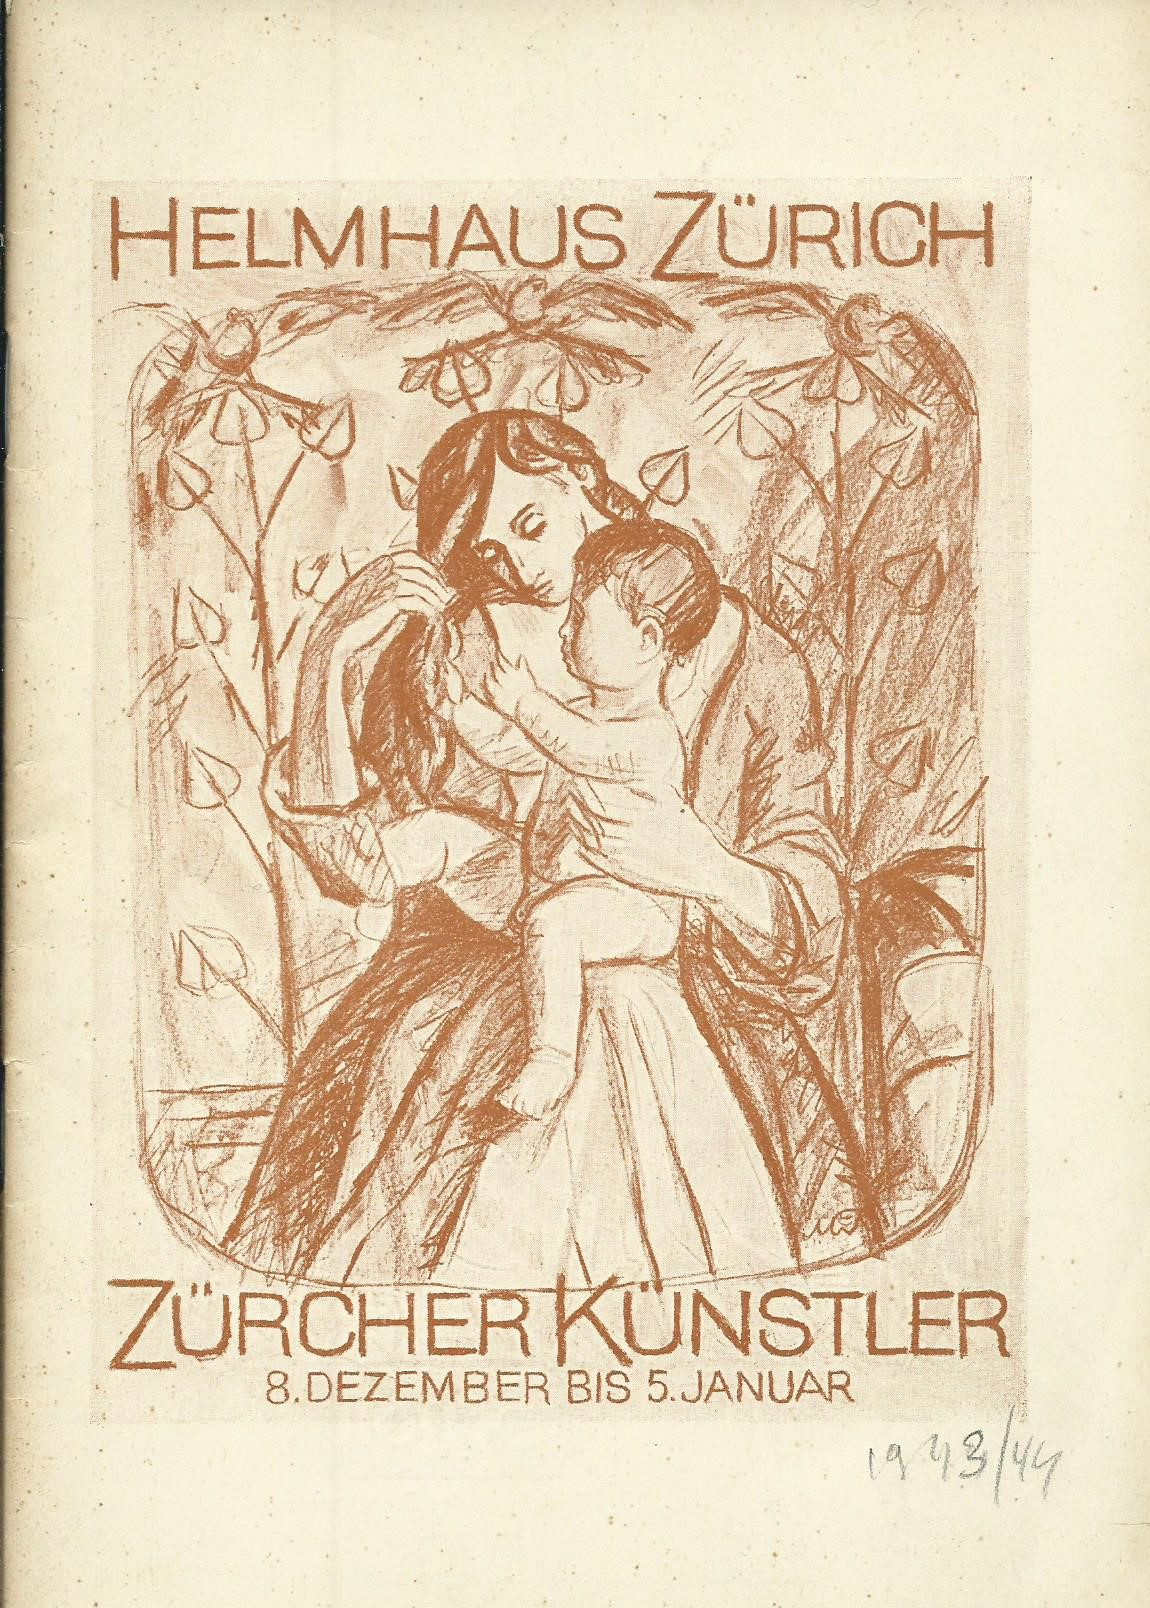 Ausstellung Zürcher Künstler im Helmhaus, 8. Dezember: Stadt Zürich, Hrsg.